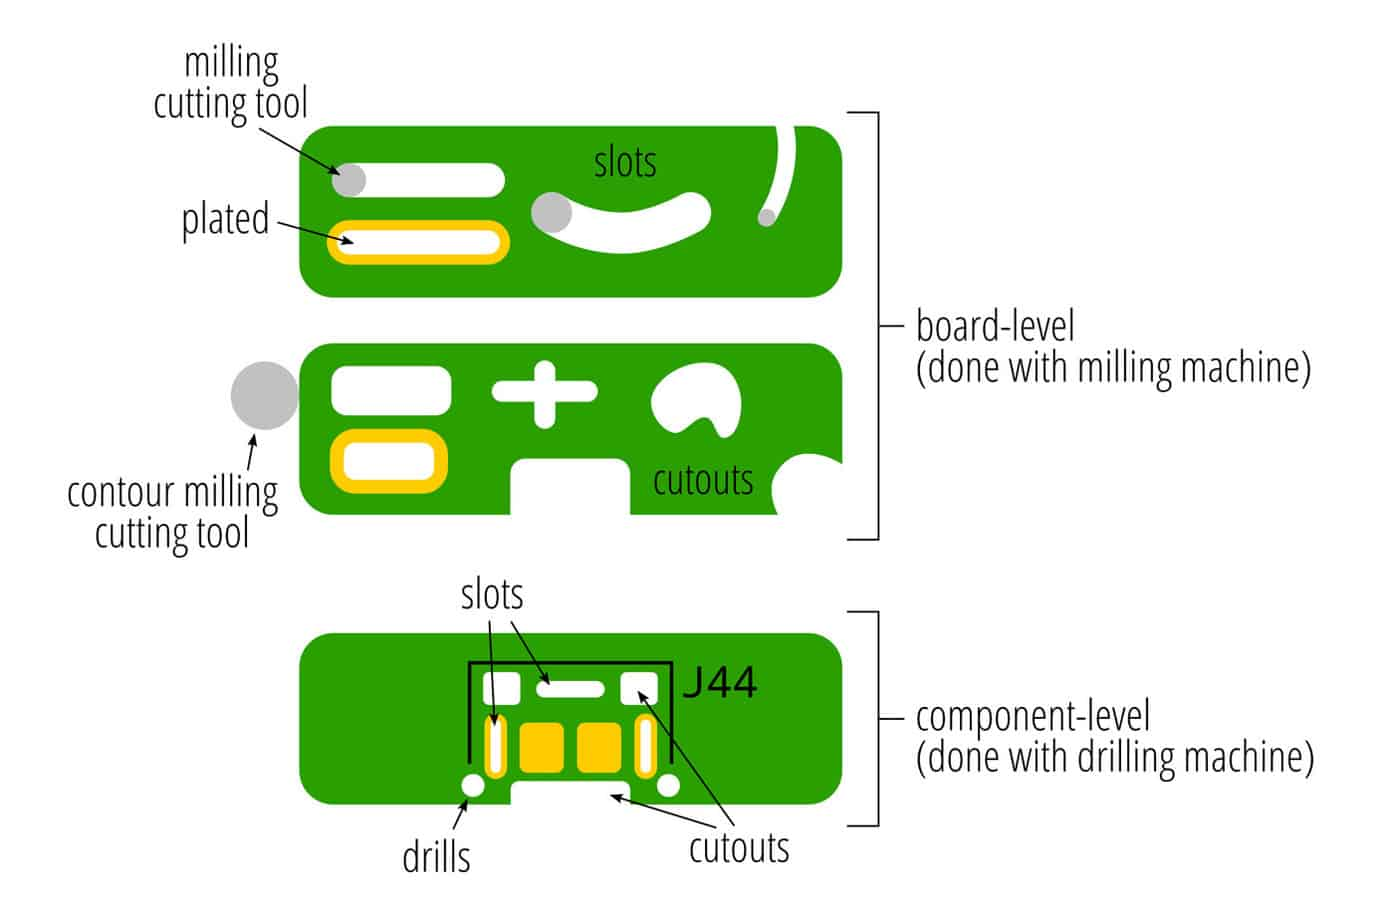 Types-of-cutouts-diagram